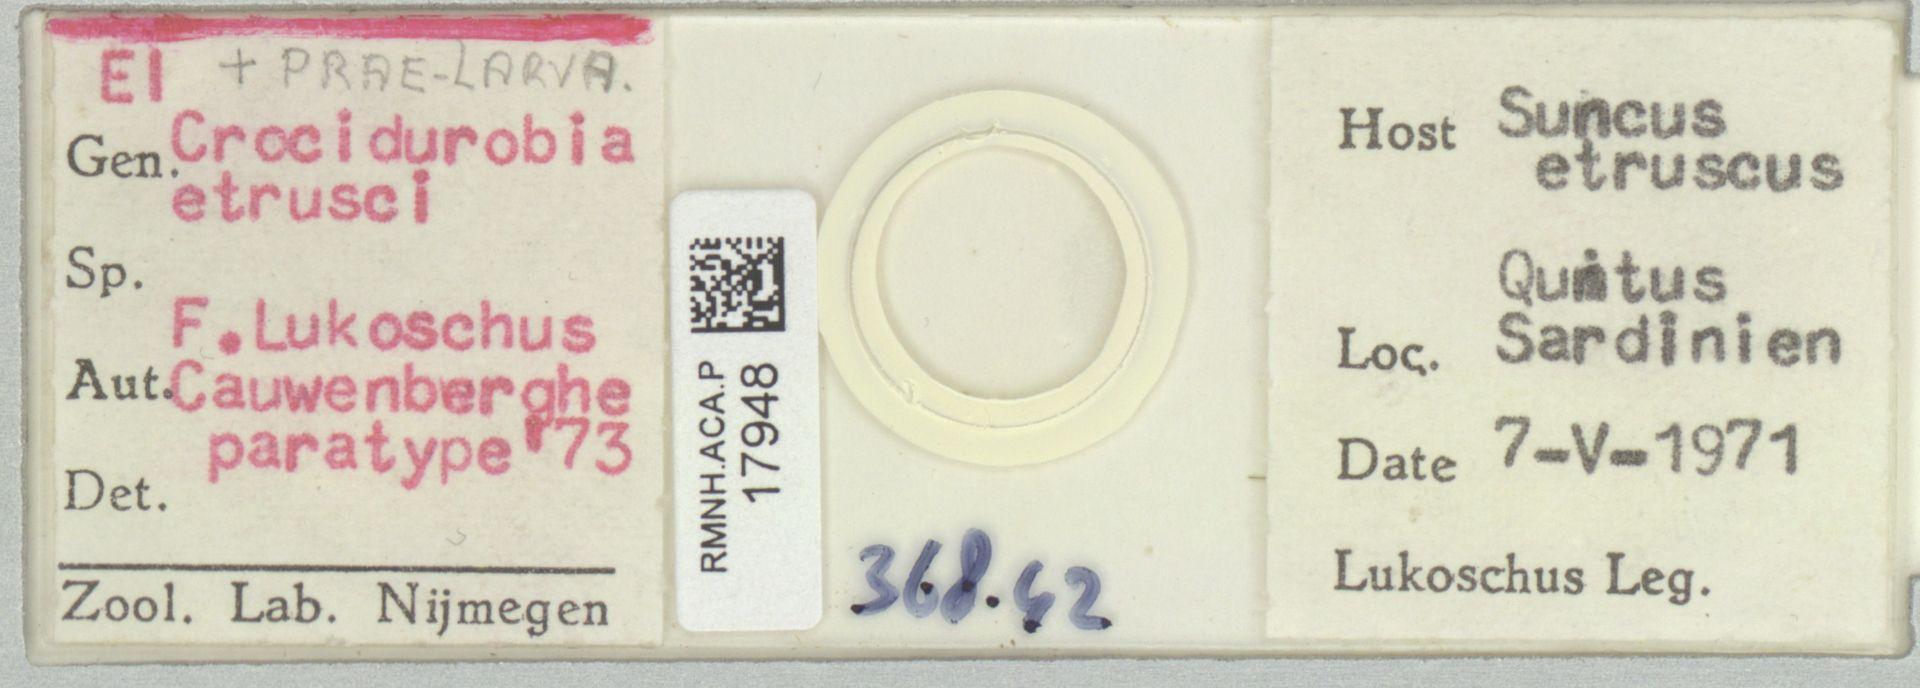 RMNH.ACA.P.17948 | Crocidurobia etrusci F. Lukoschus, Cauwenberghe